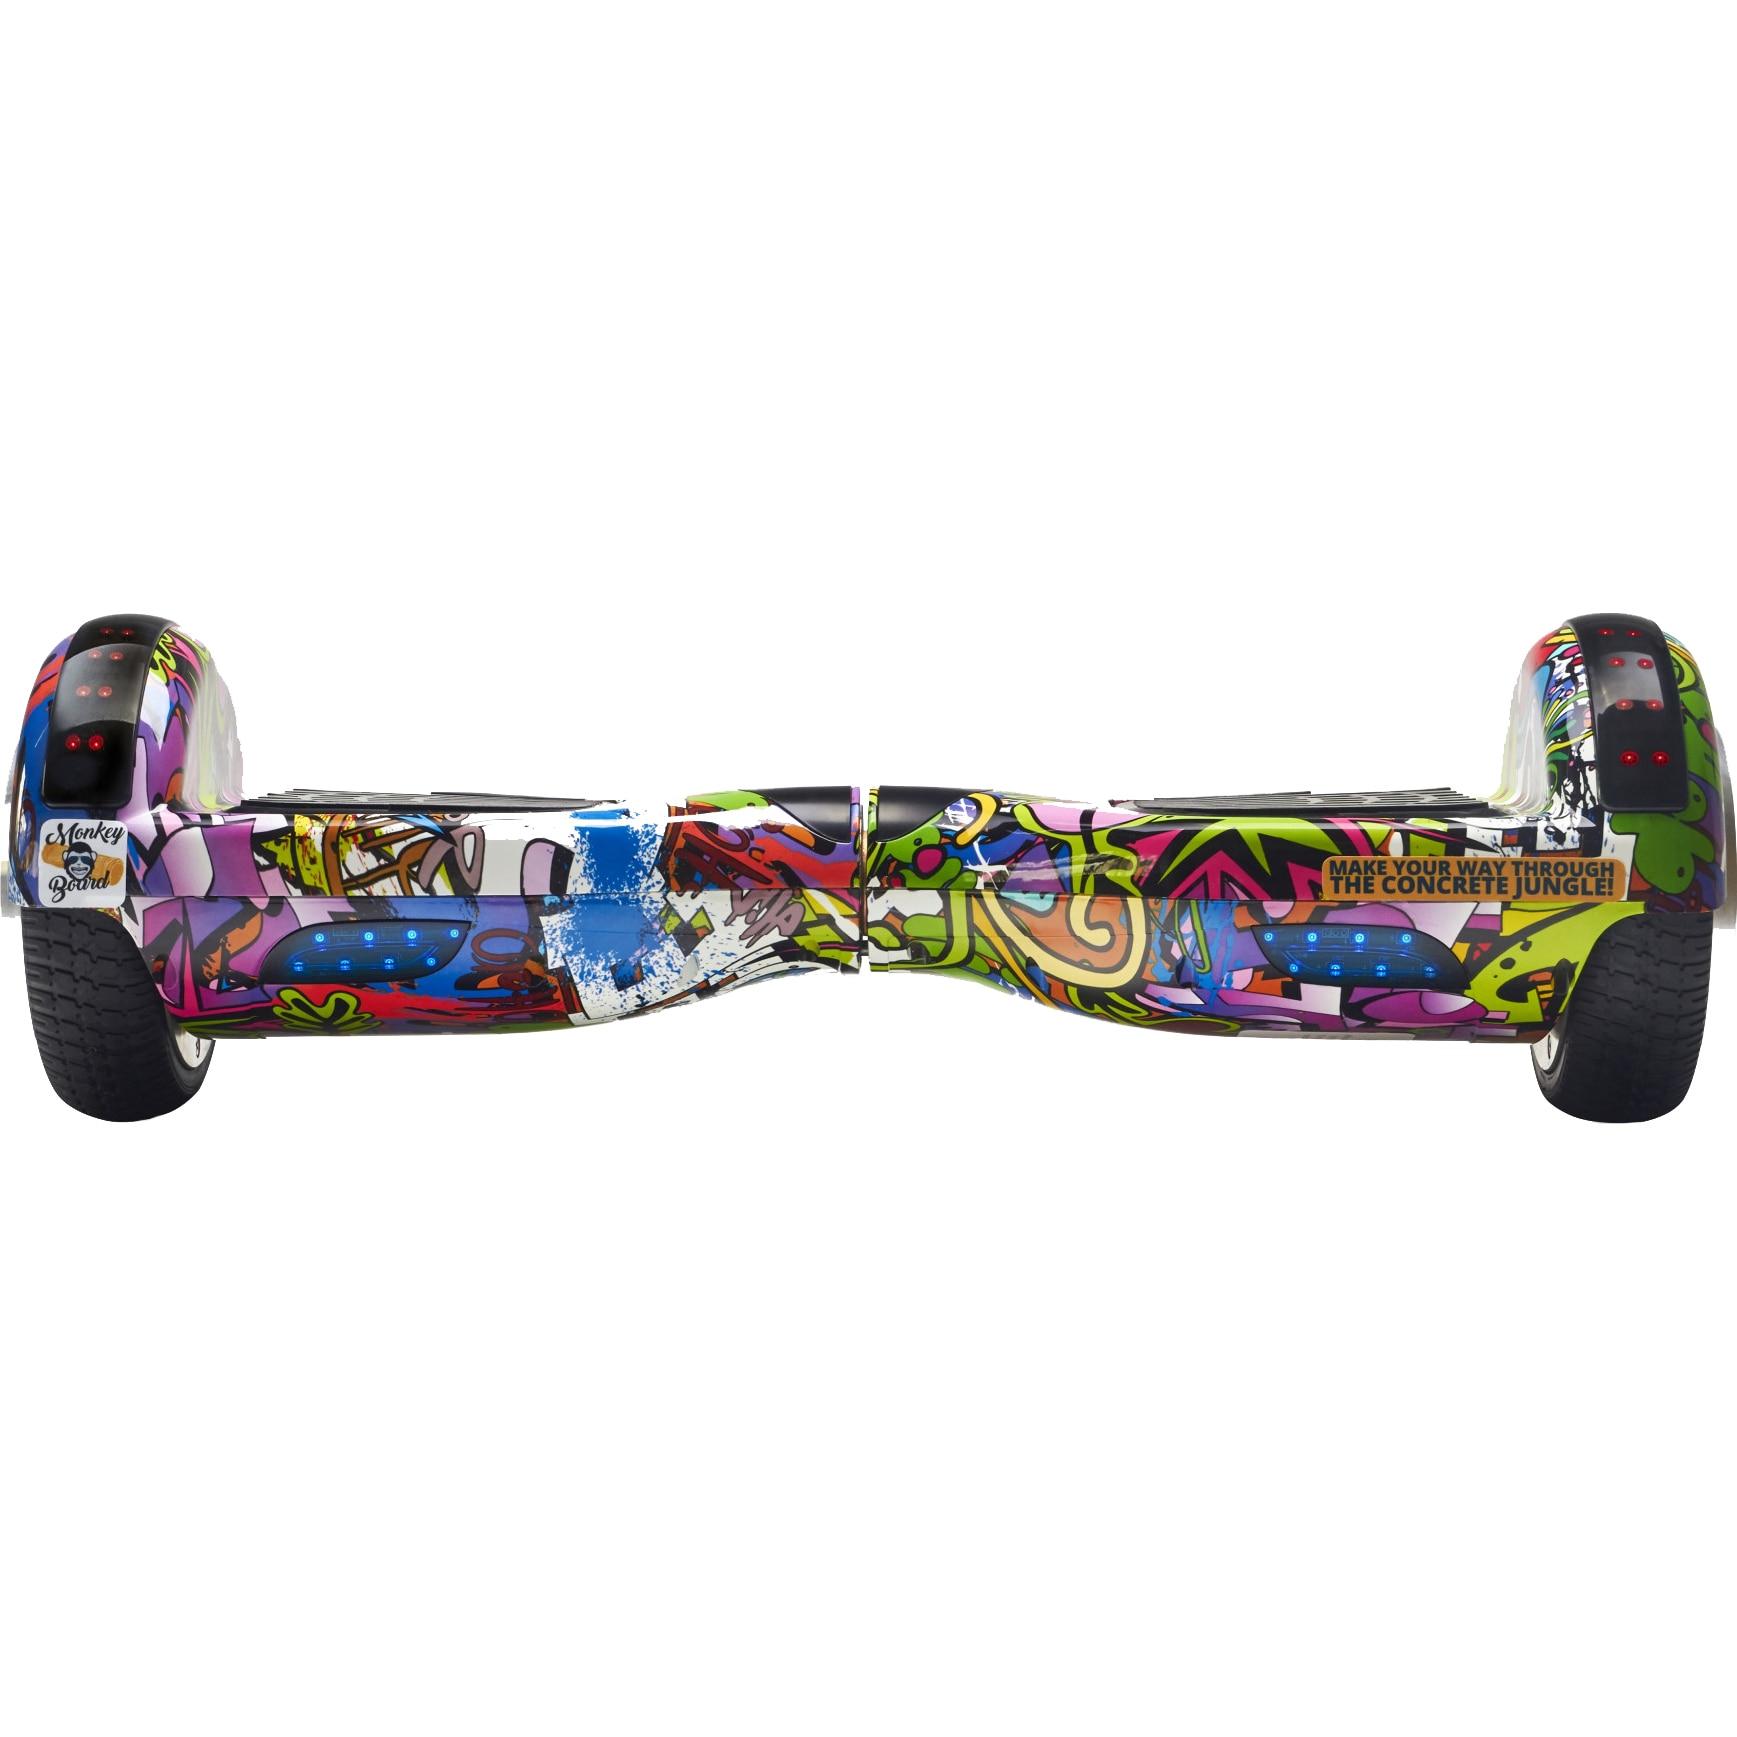 Fotografie Hoverboard Original MonkeyBoard® Jungle Mania, Scuter electric, roti 6.5 inch, bluetooth, geanta de transport cadou, led-uri, lumini de zi/noapte, boxa incorporata, 1000w